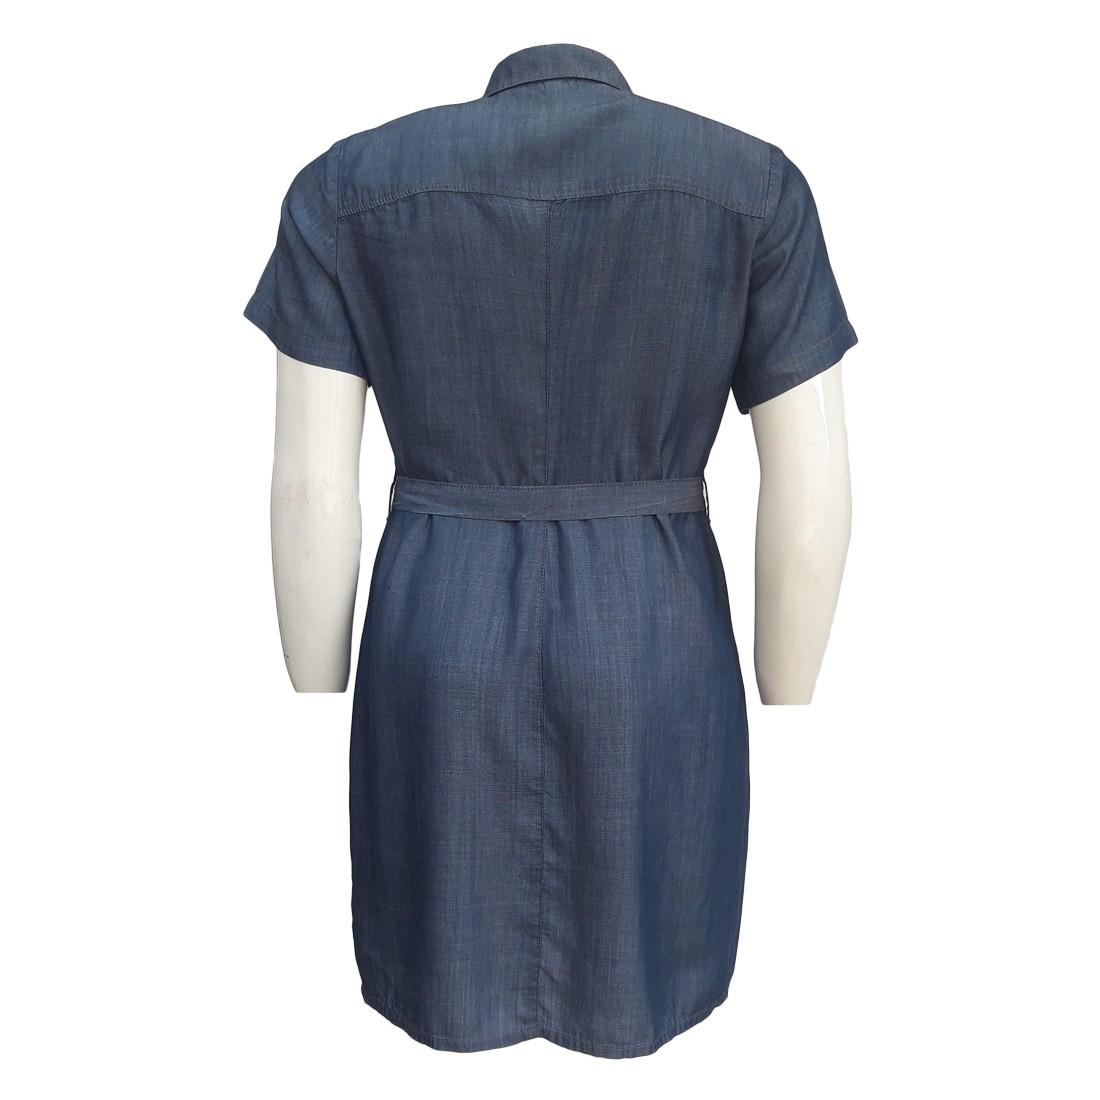 Vestido Jeans Liocel Chemisier Moda Evangélica Plus Size